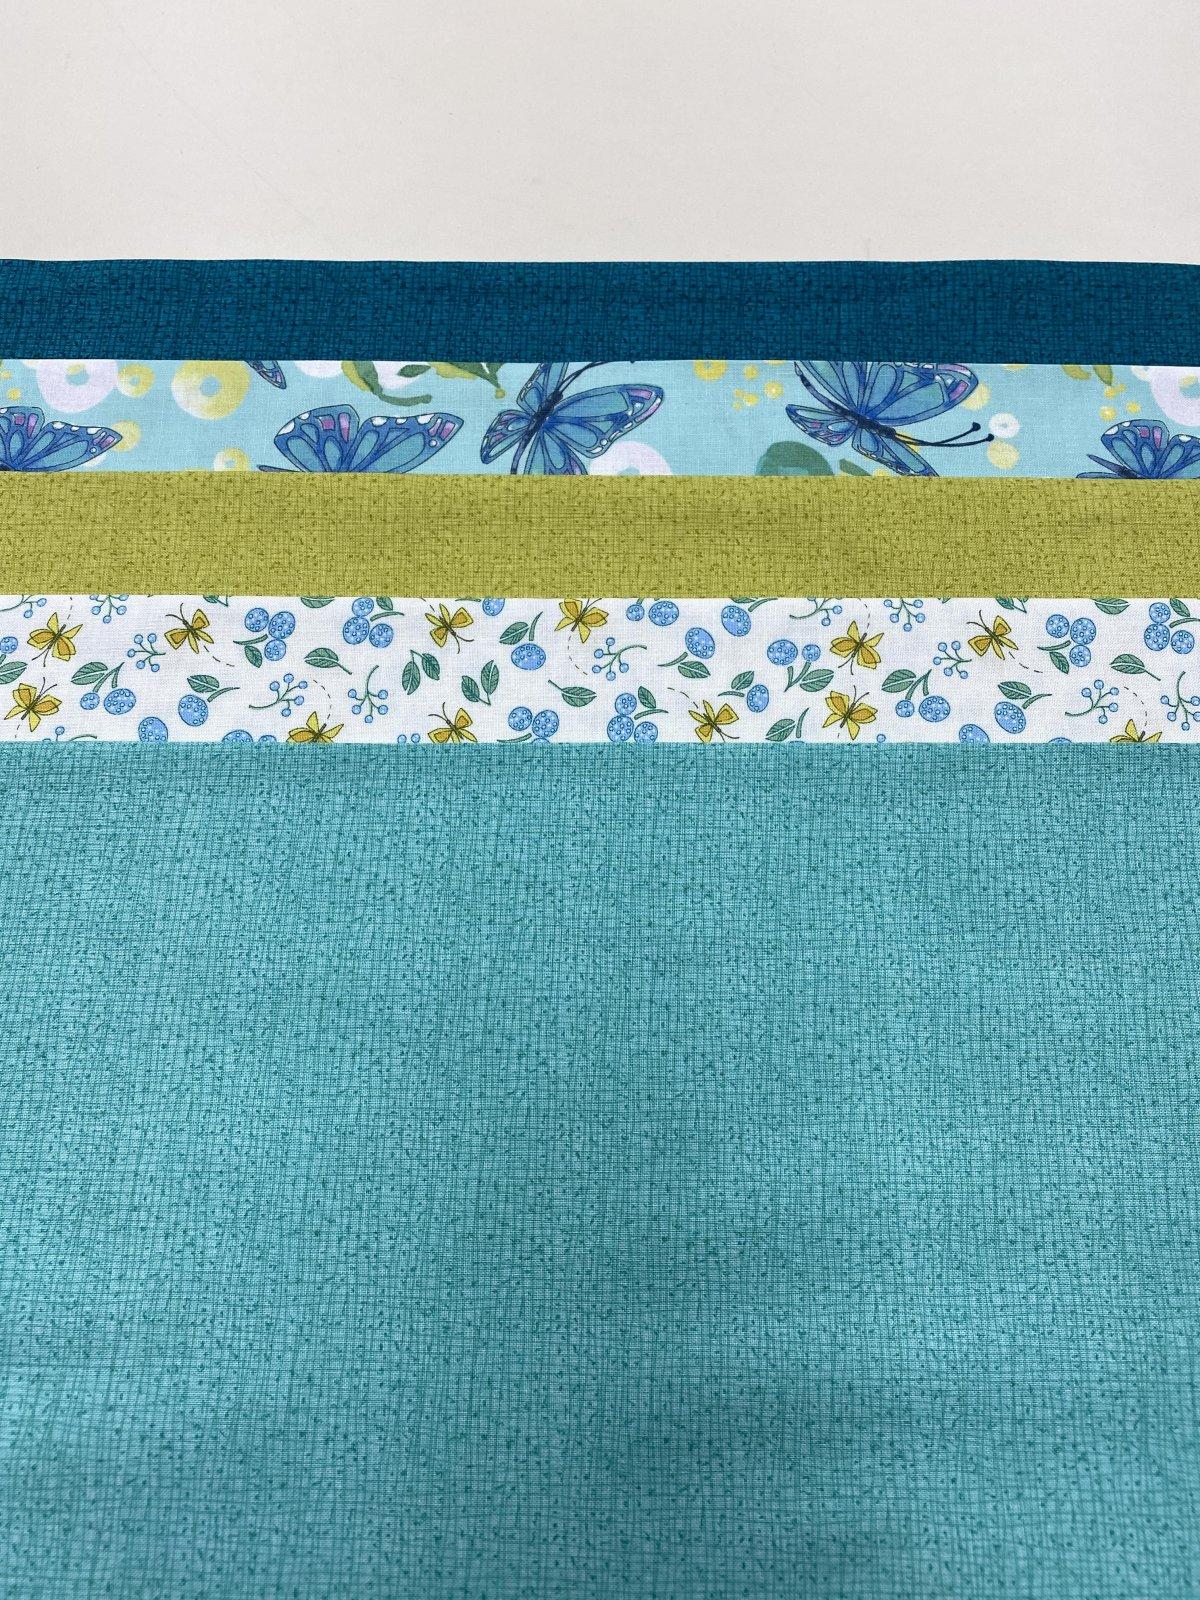 Cottage Bleu (5) Half Yard Cuts by Robin Pickens for Moda